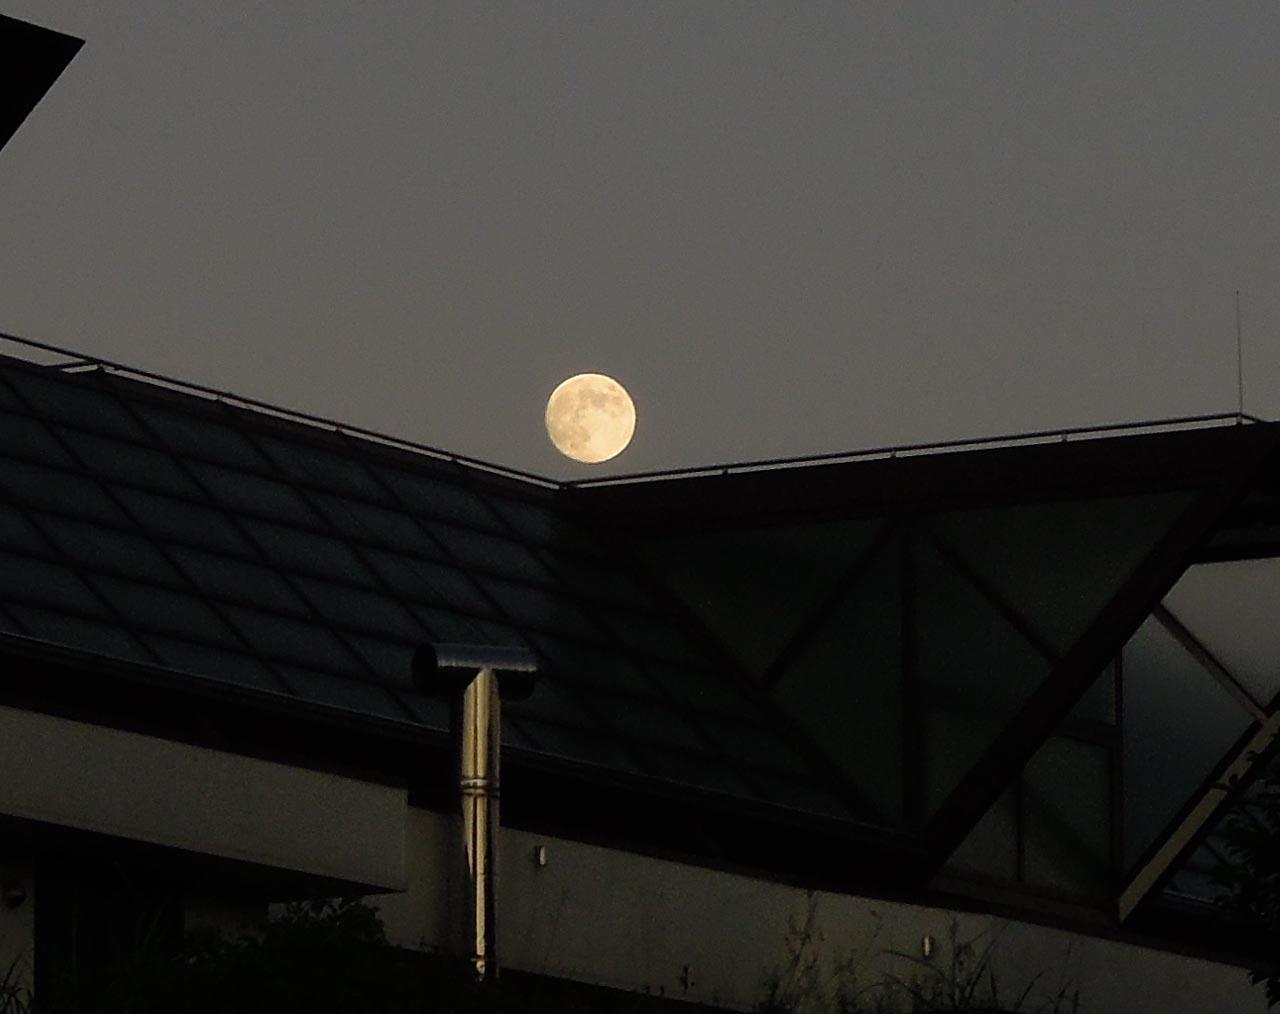 nikonp300_moon.jpg